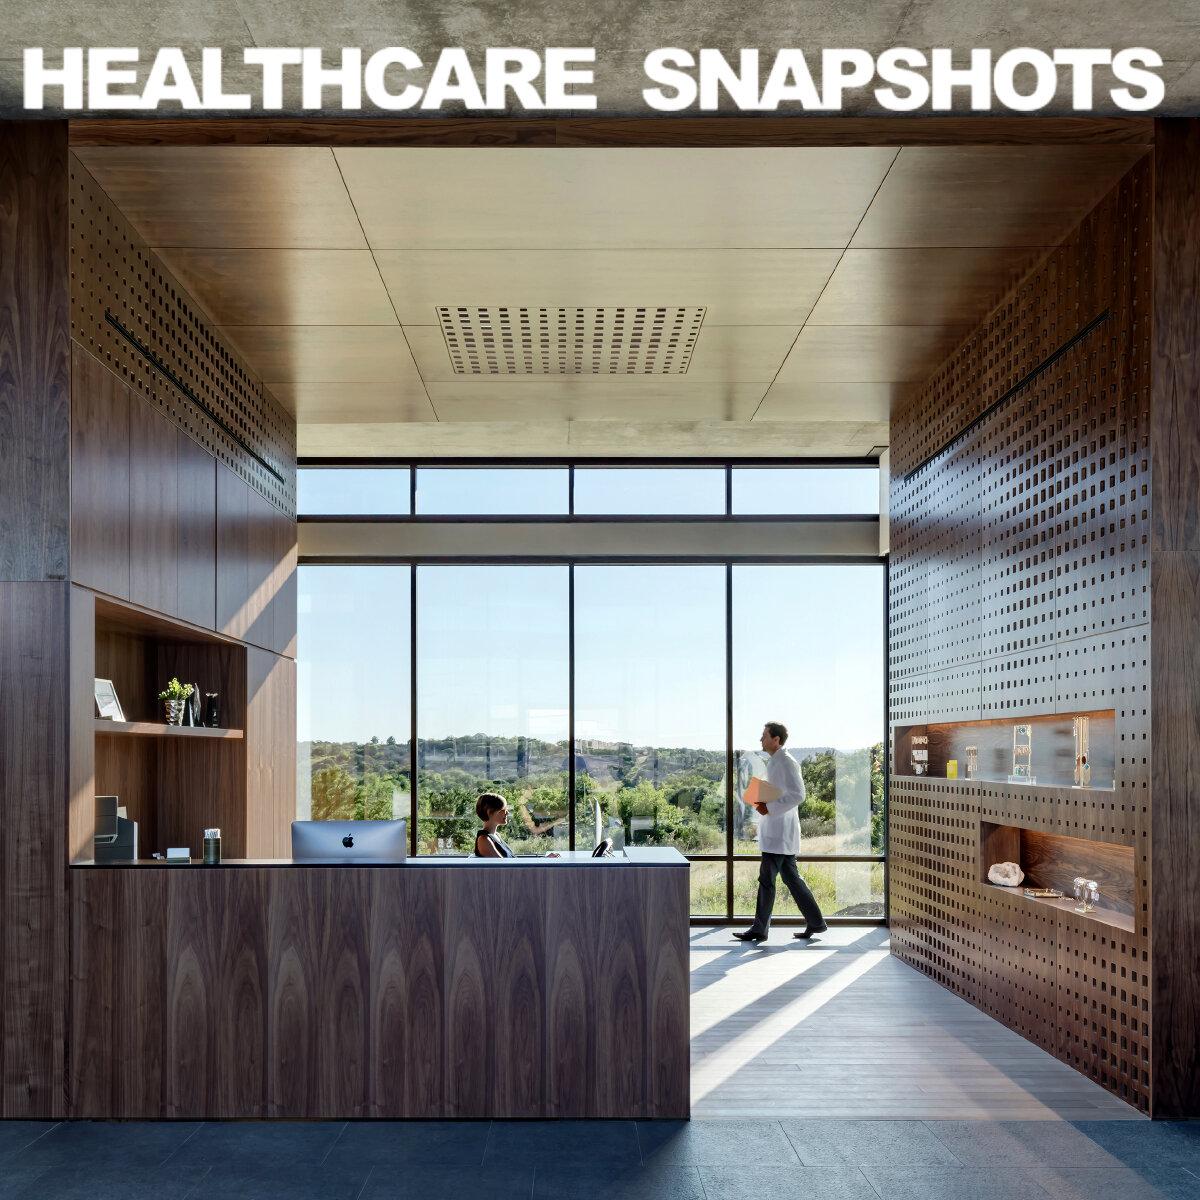 Healthcare Snapshots_2019_09_WDMF